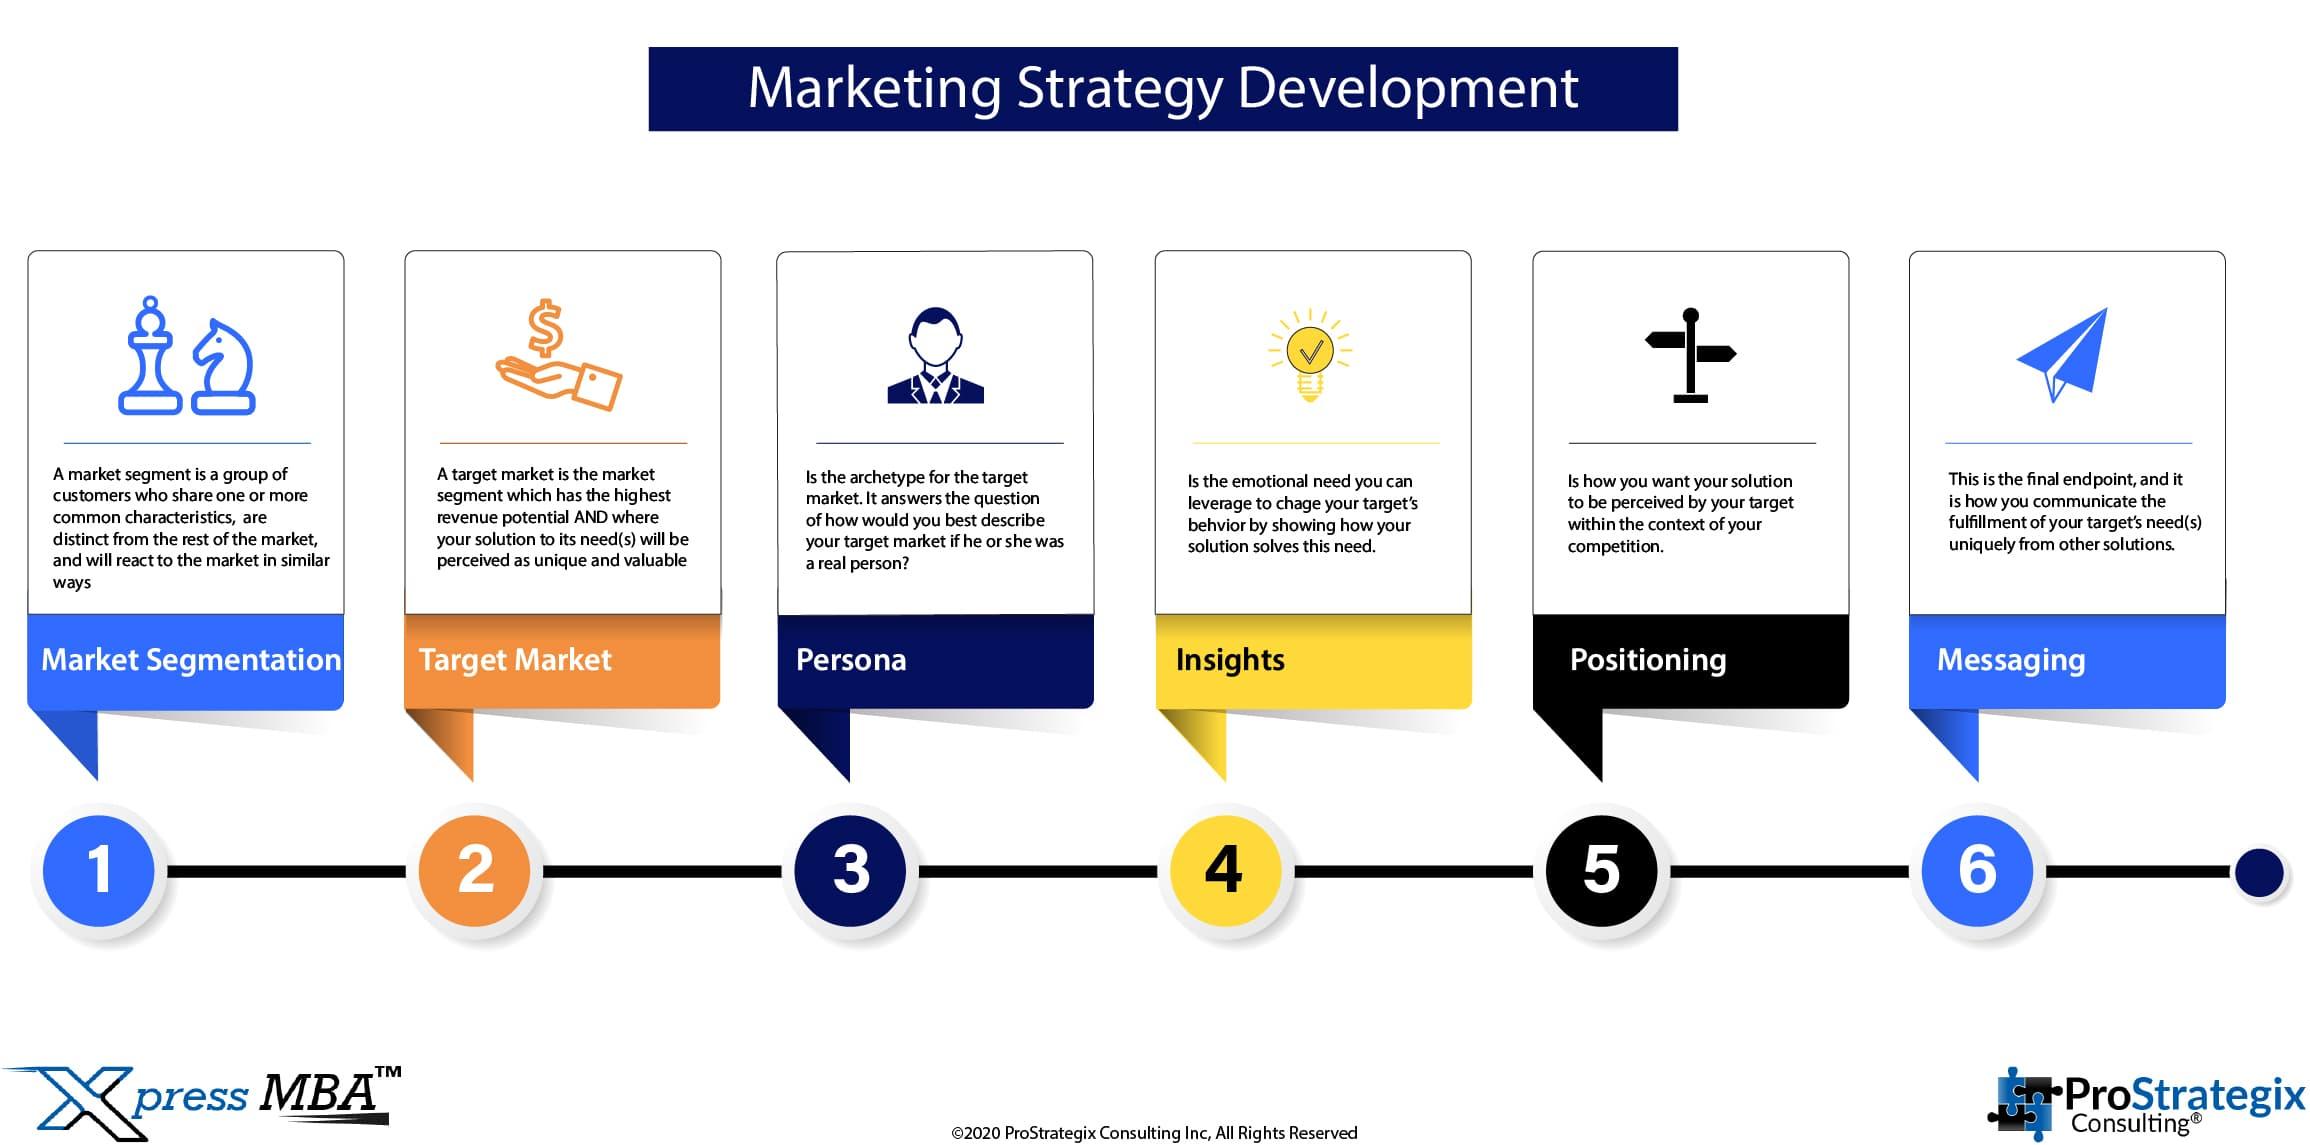 ProStrategix Marketing Strategy Development Process